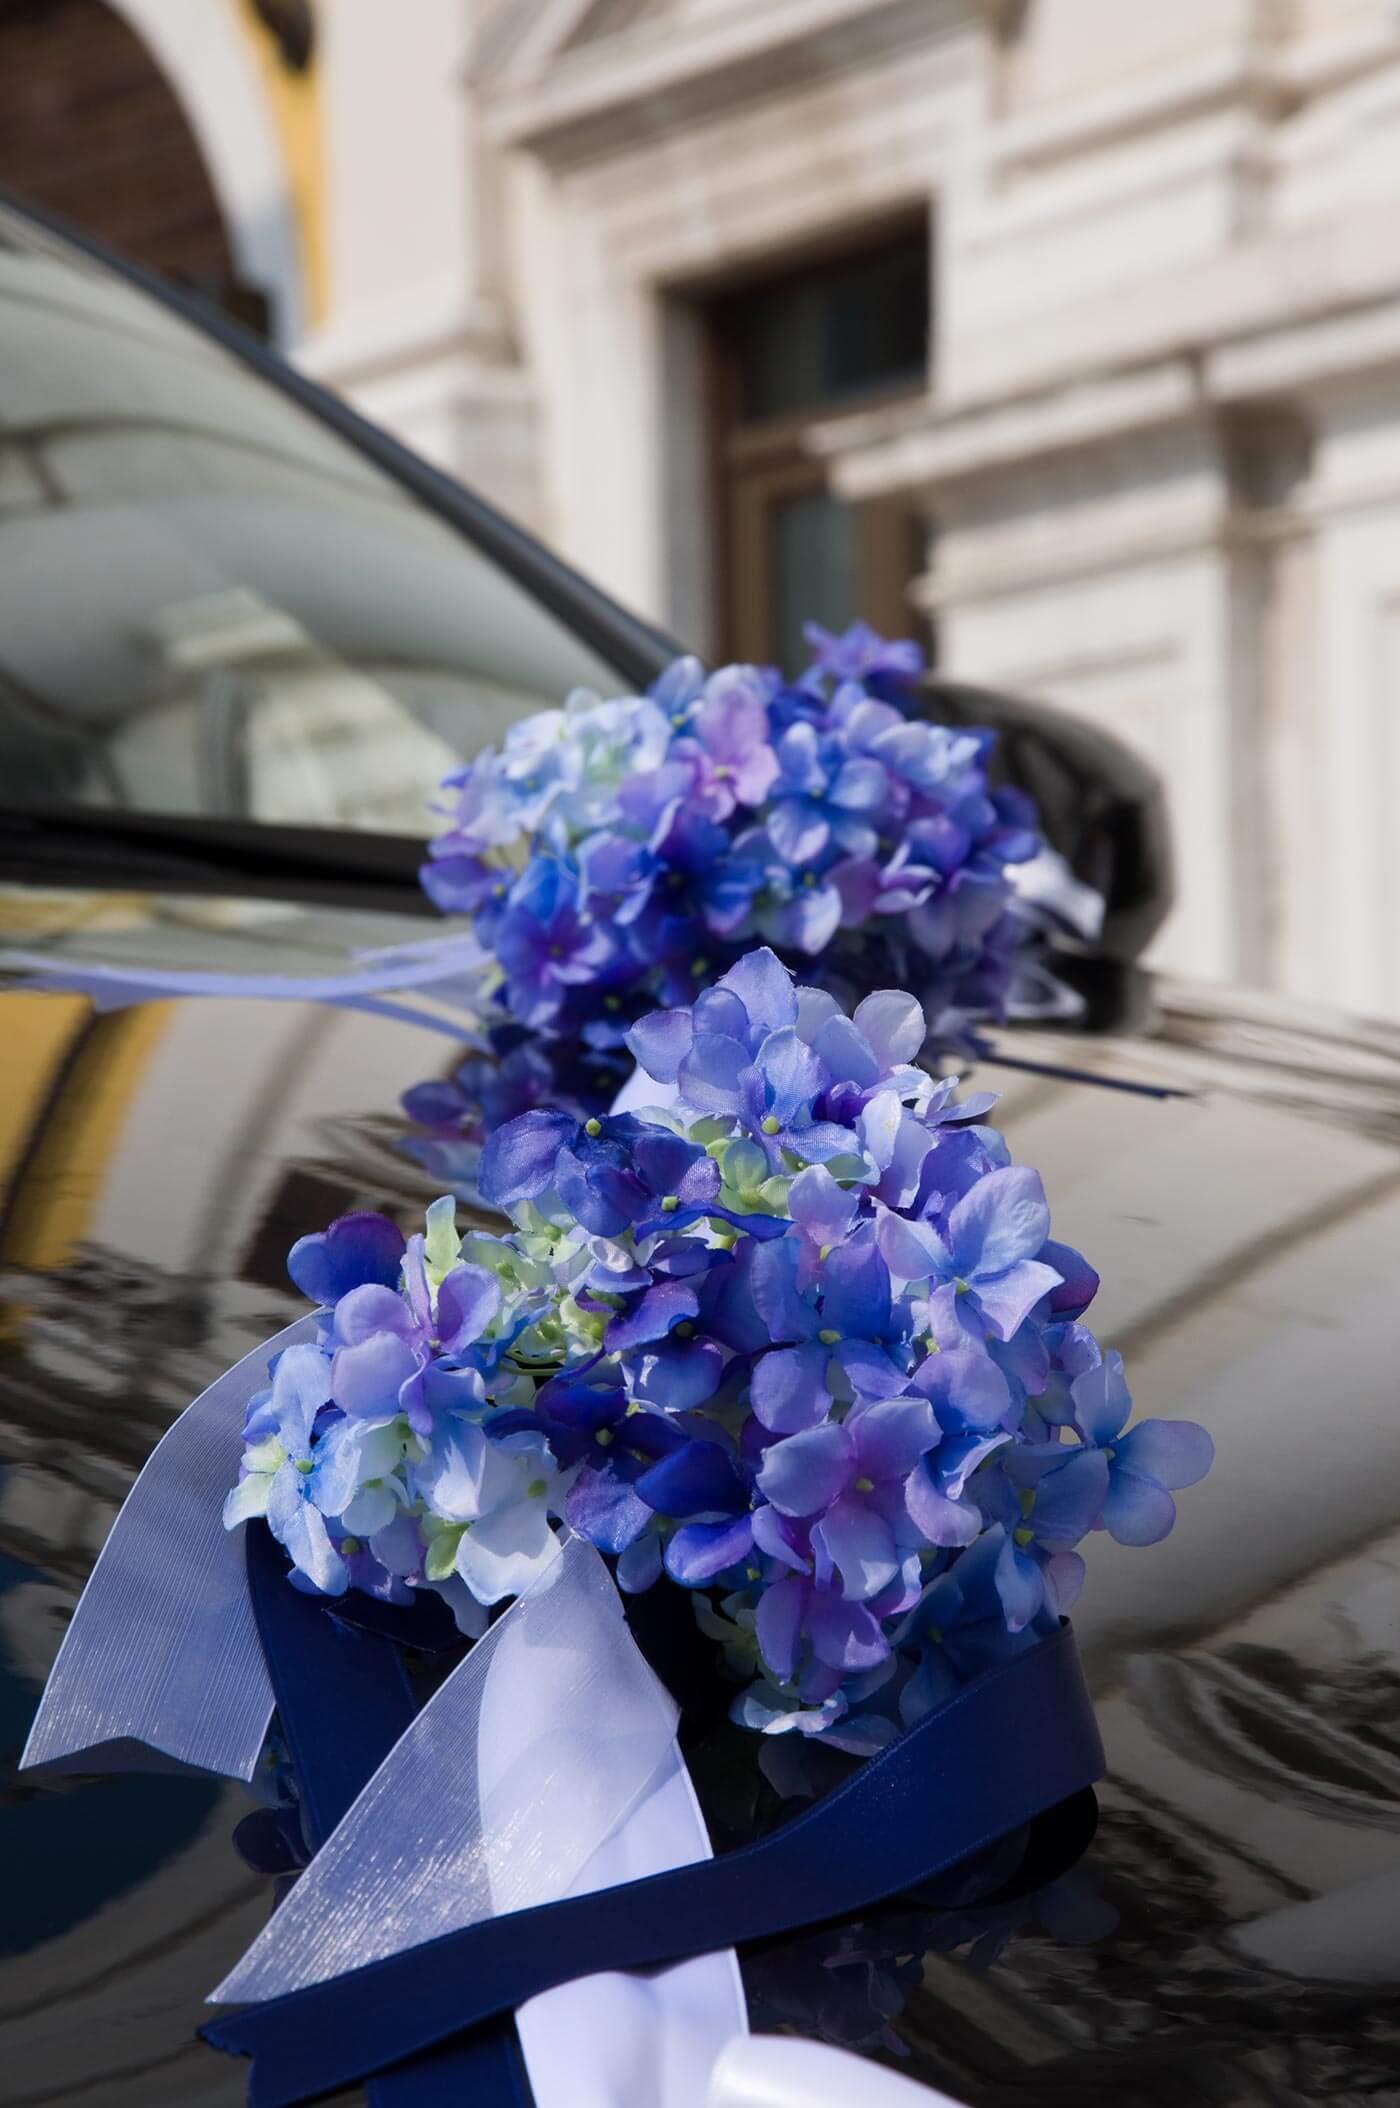 Autodeko in Blau mit Hortensie  Groe Bildergalerie